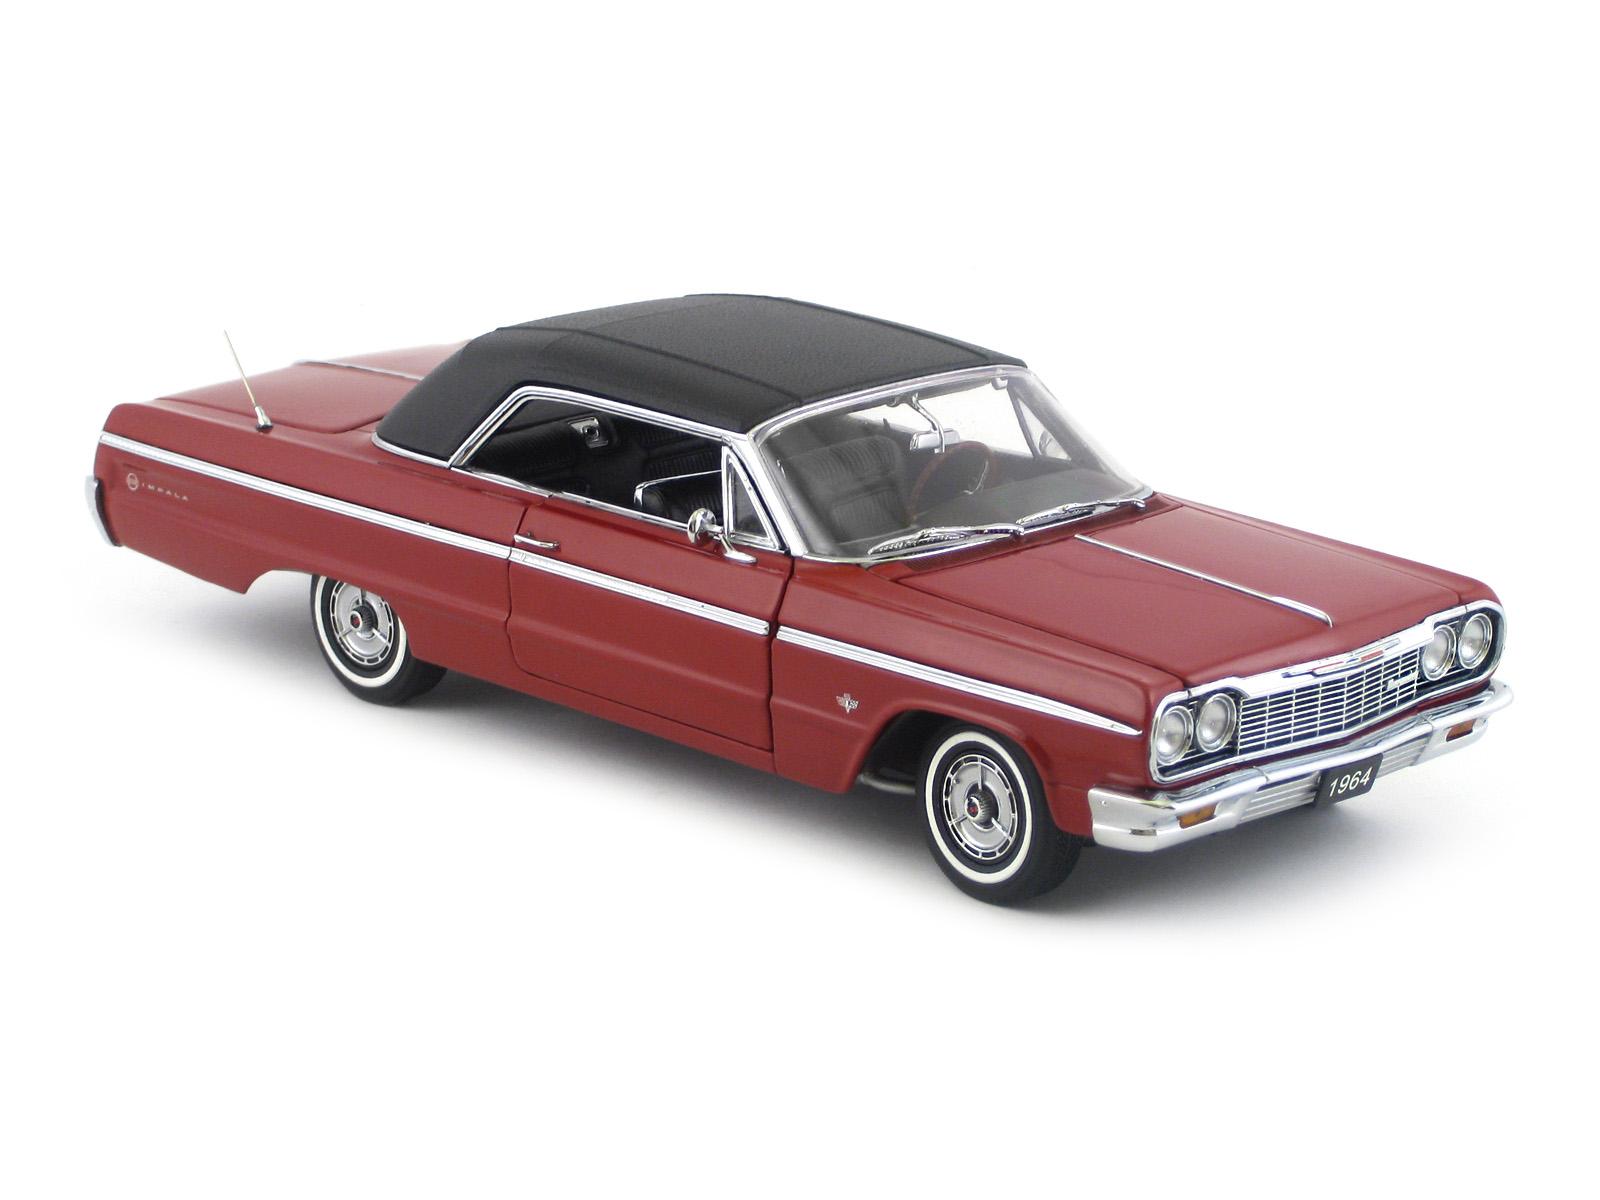 1964 Chevrolet Impala Ss Coupe West Coast Precision Diecast